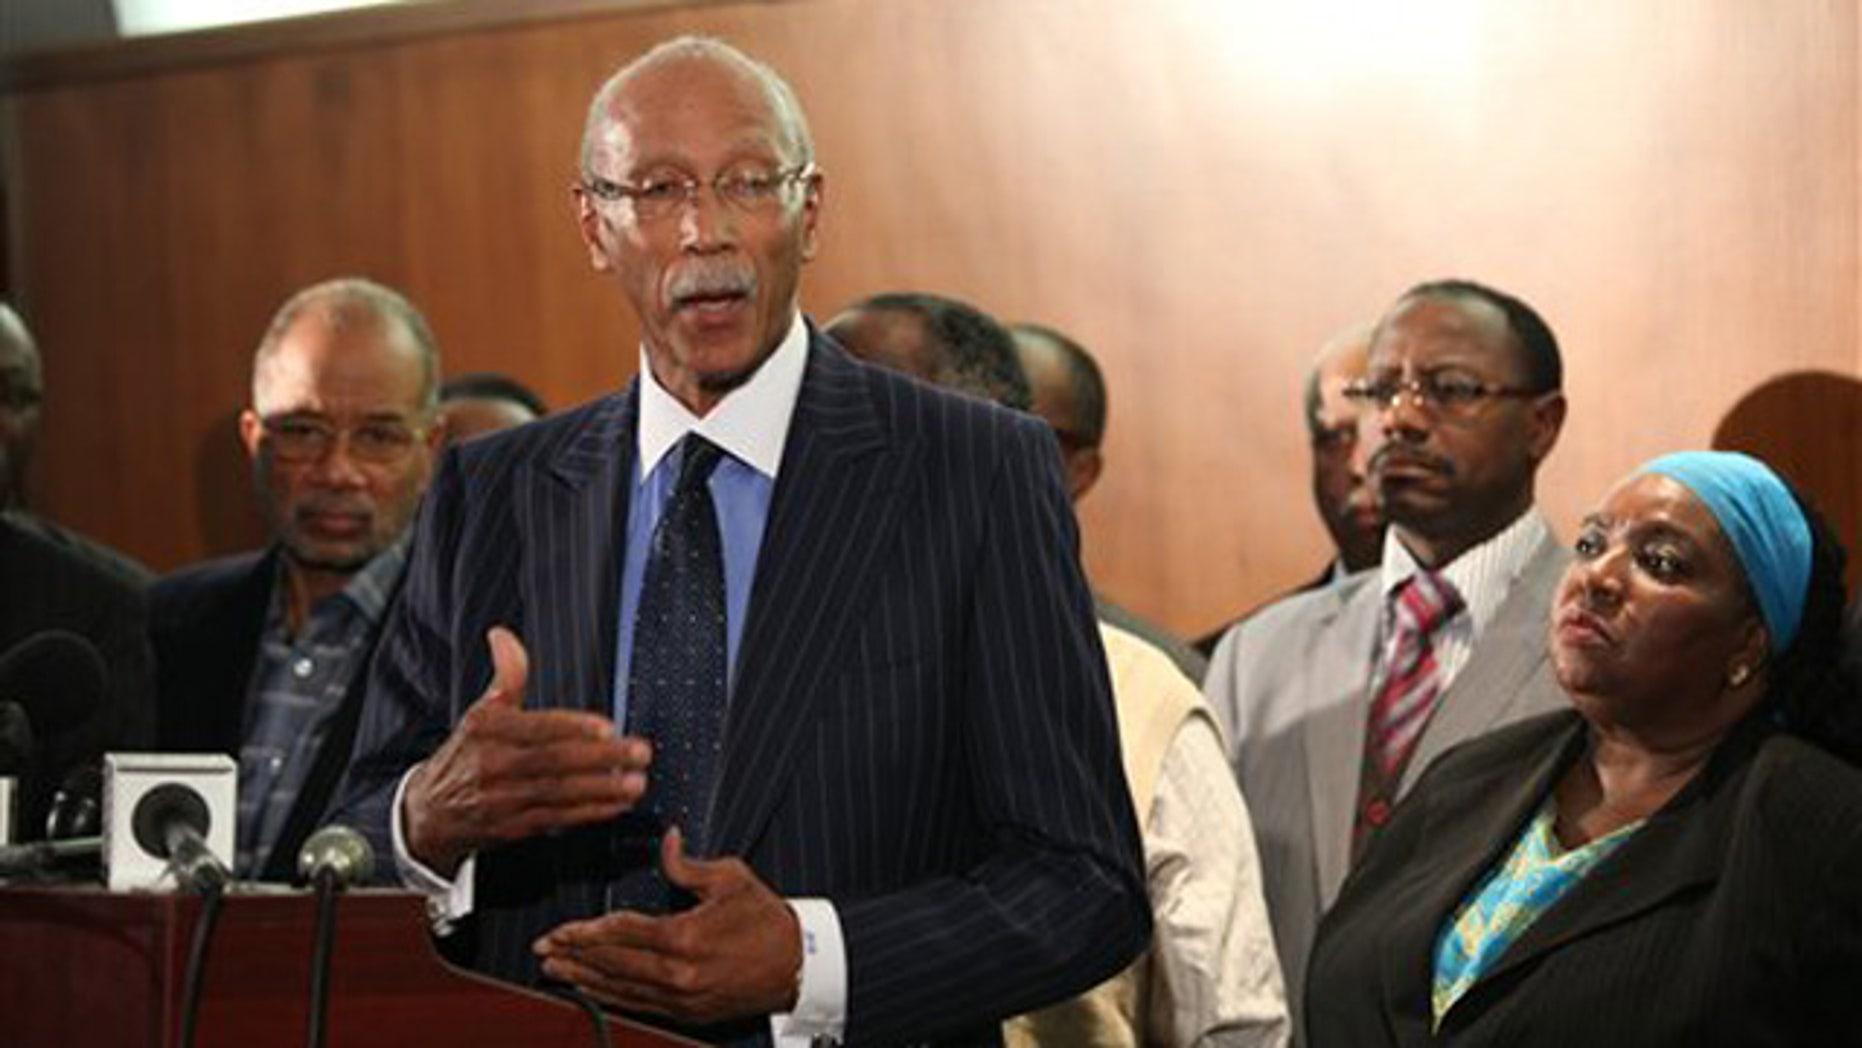 Dec. 1, 2011: Detroit Mayor Dave Bing, religious leaders, labor and Detroit City Council members speak in Detroit.